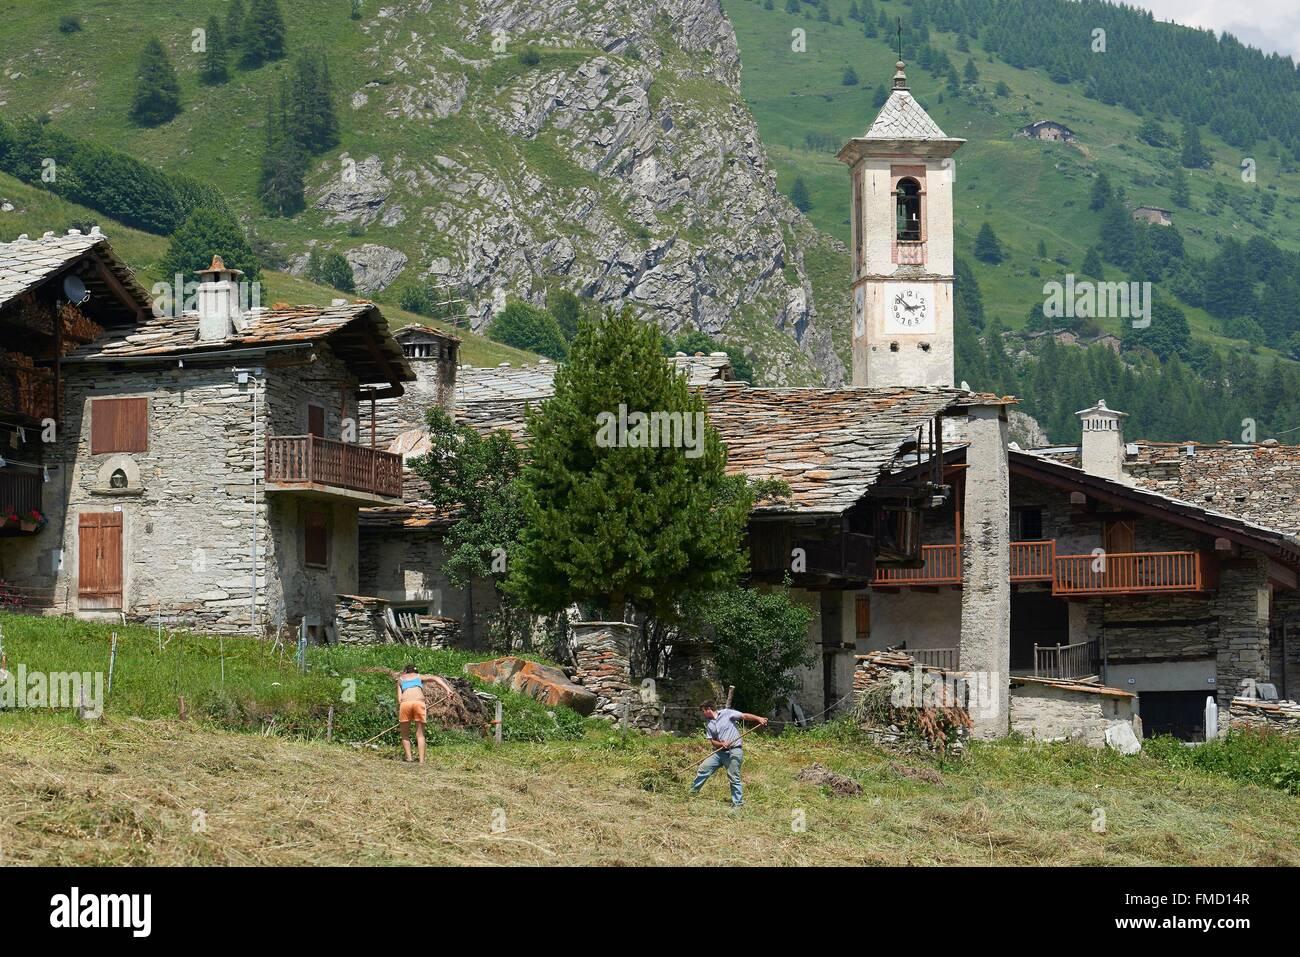 Italy, Piemont, Val Varaita, Chianale, church - Stock Image